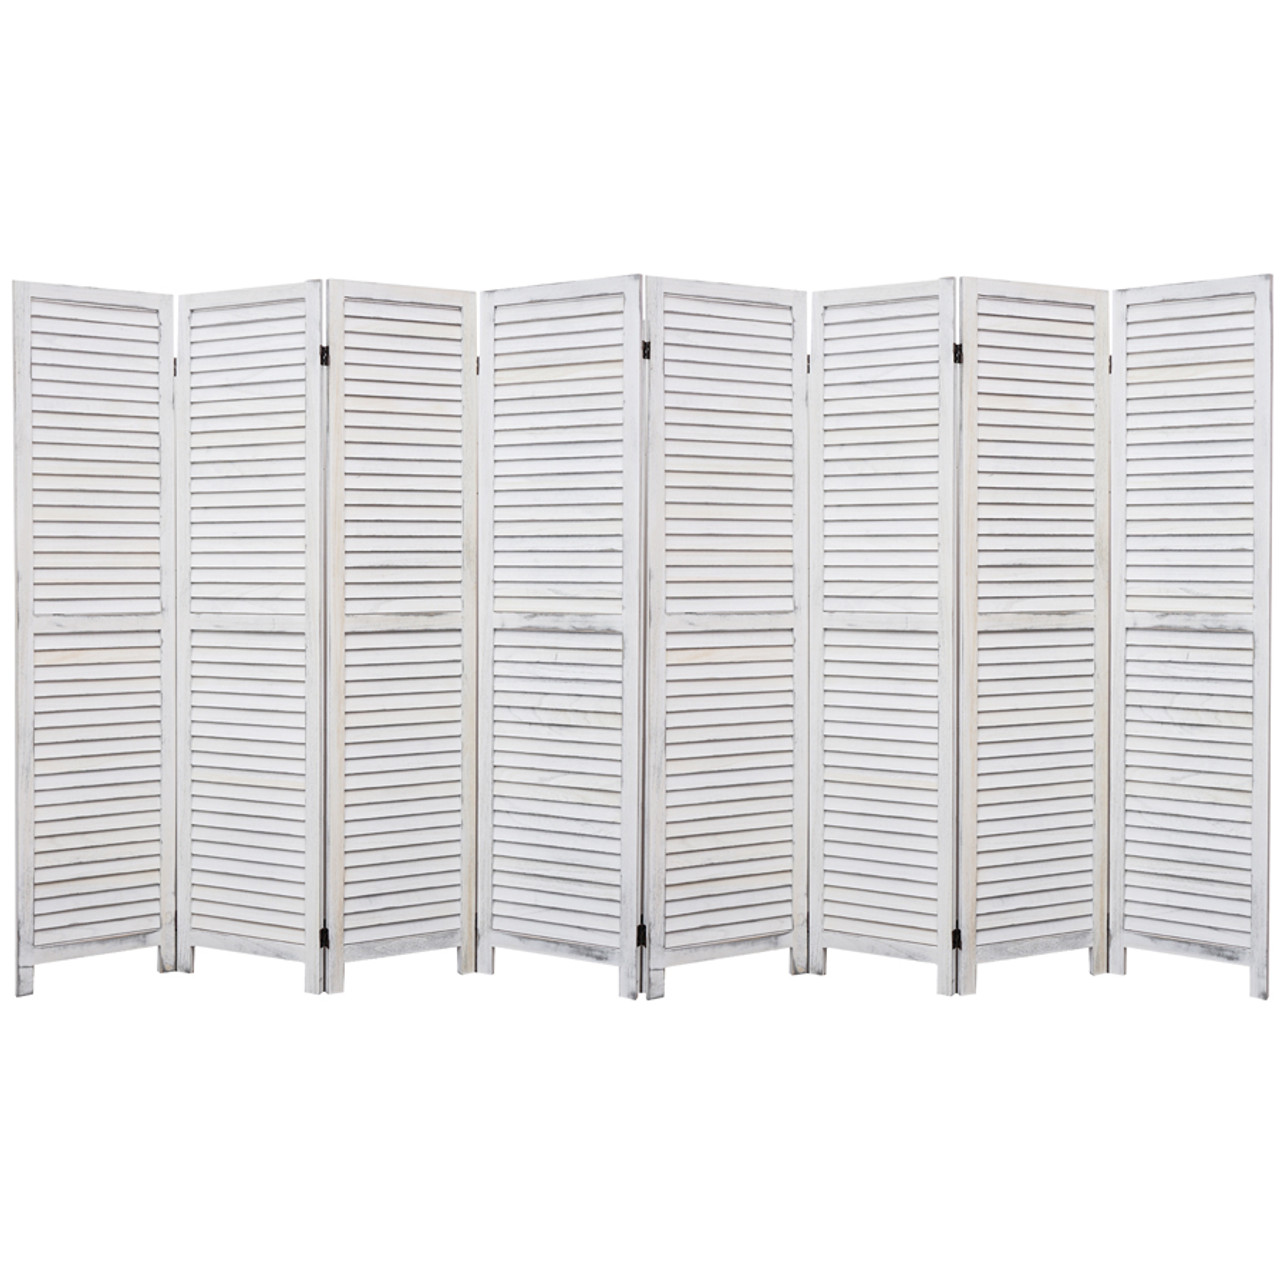 4, 6, 8 Panel Room Divider Full Length Wood Shutters White in USA, California, New York, NY City, Los Angeles, San Francisco, Pennsylvania, Washington DC, Virginia, Maryland